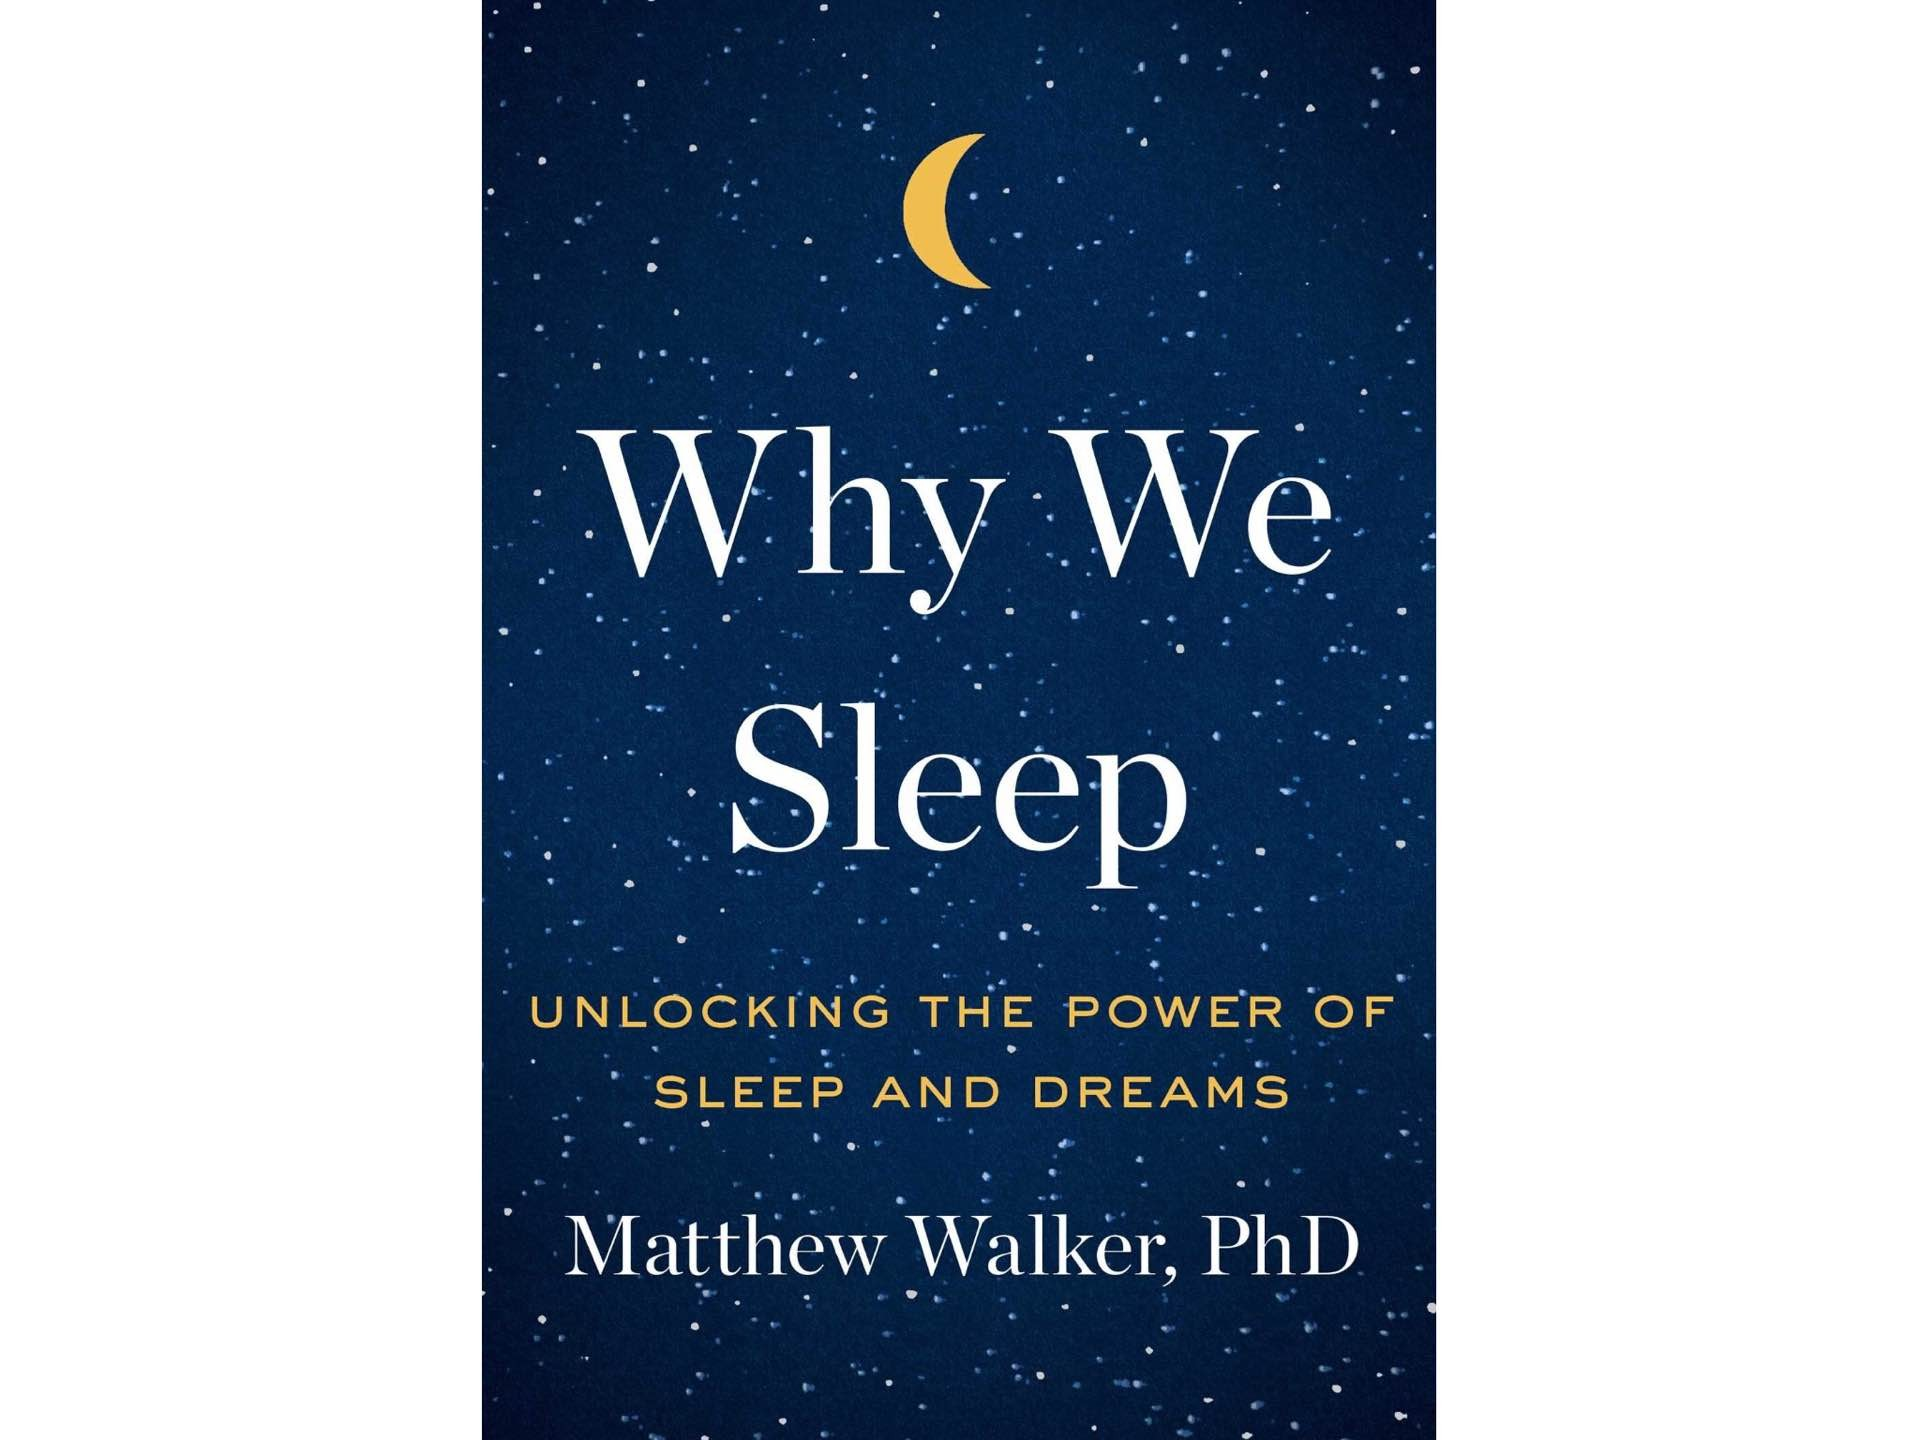 why-we-sleep-by-matthew-walker